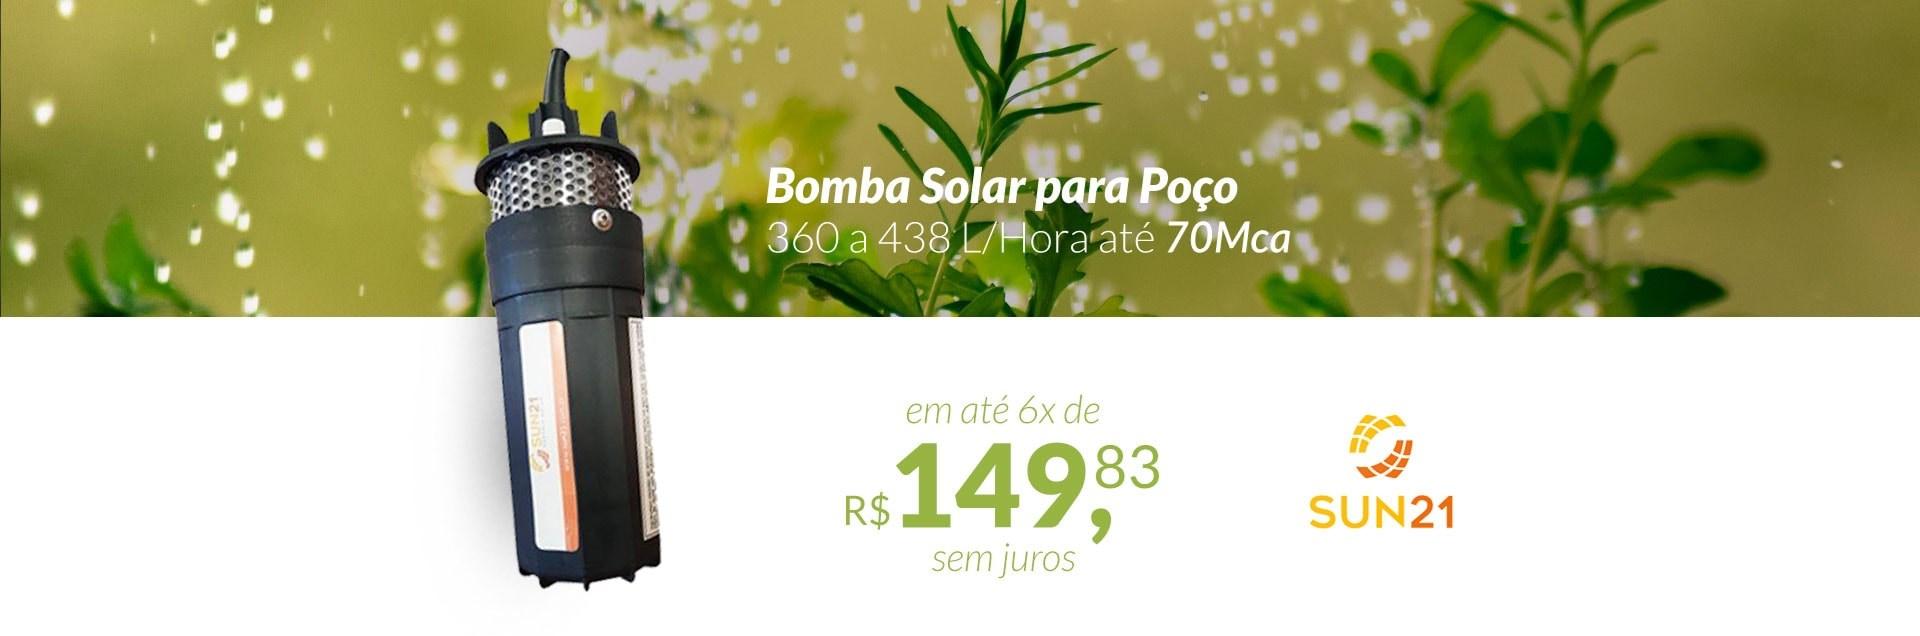 Bomba Solar 360 a 438 L/Hora Ate 70Mca Sun21